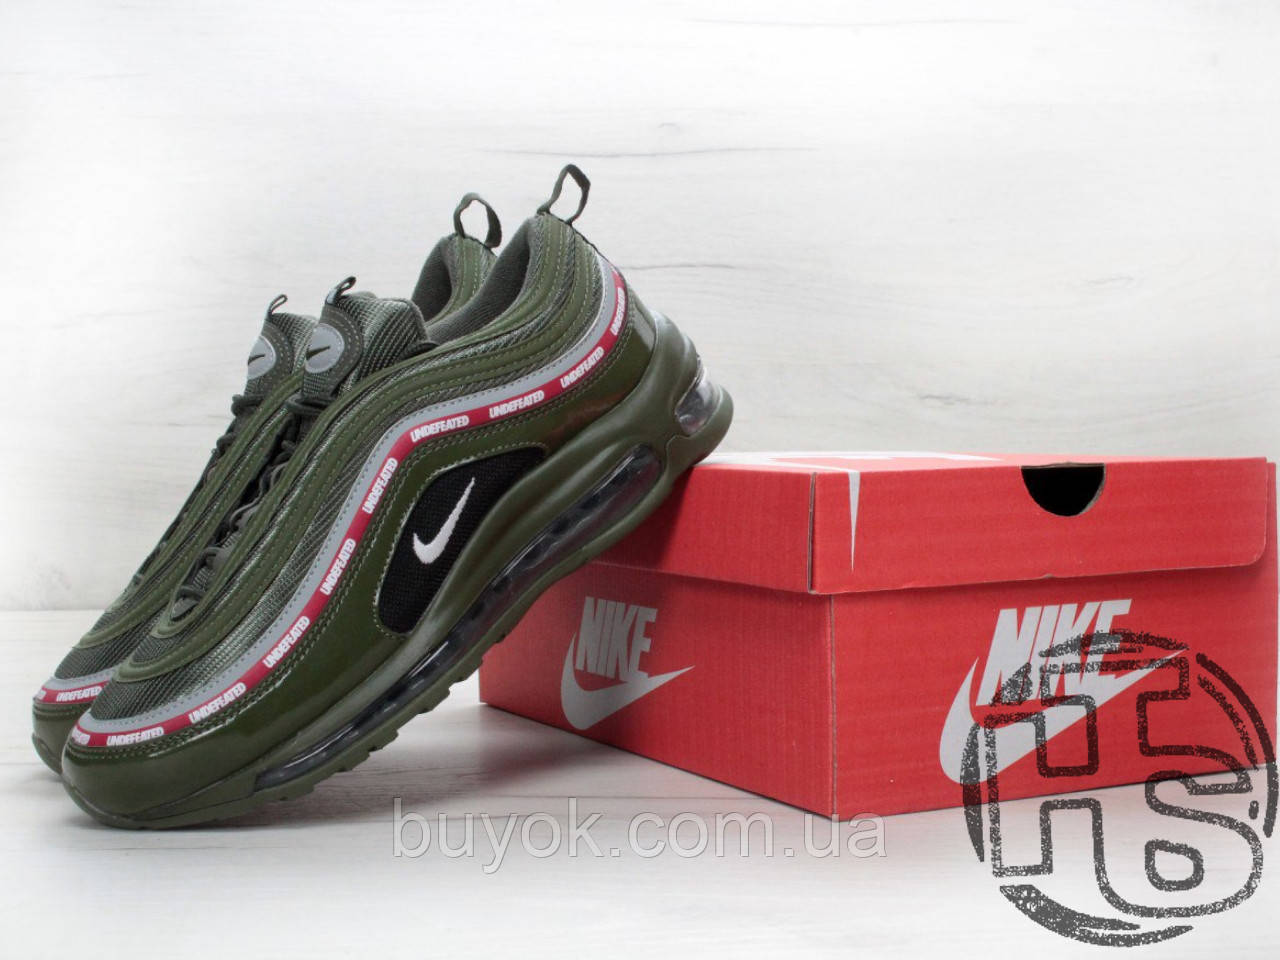 Чоловічі кросівки Nike Air Max 97 OG x Undefeated Green